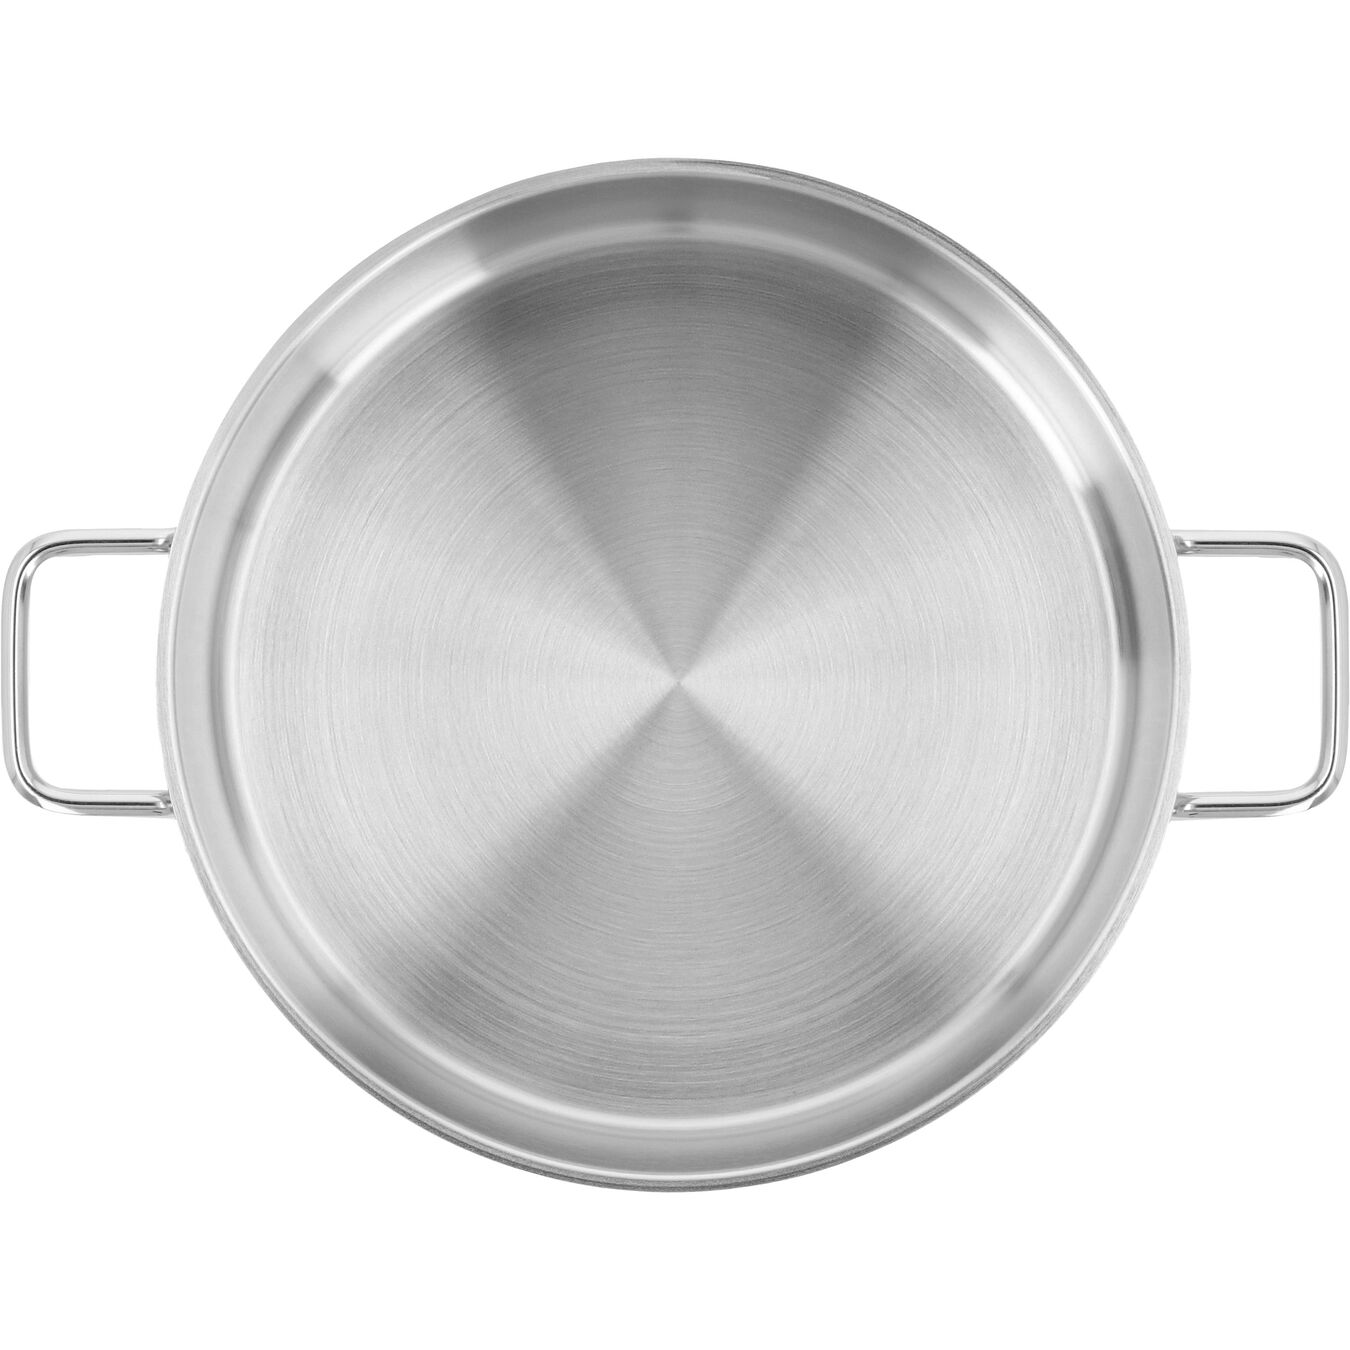 Kookpan met glazen deksel 28 cm / 4.75 l,,large 5